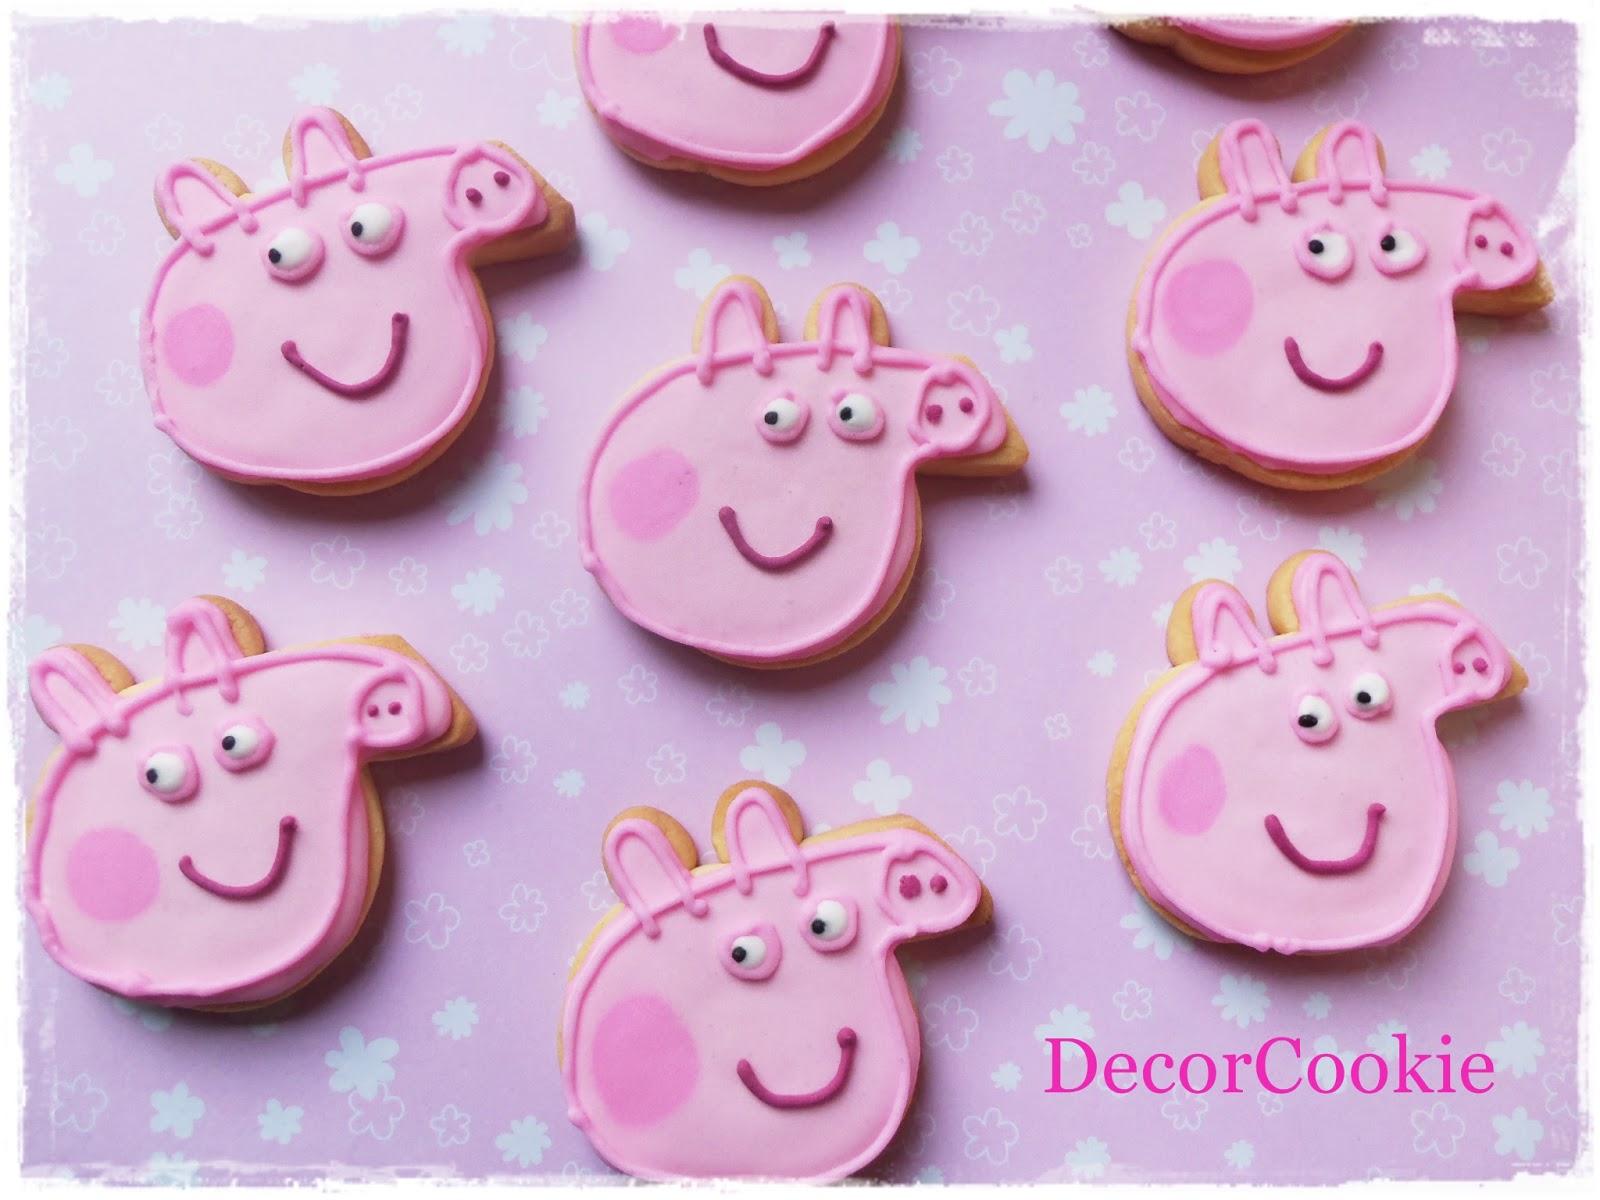 Galletas Decoradas Decorcookie Infantiles